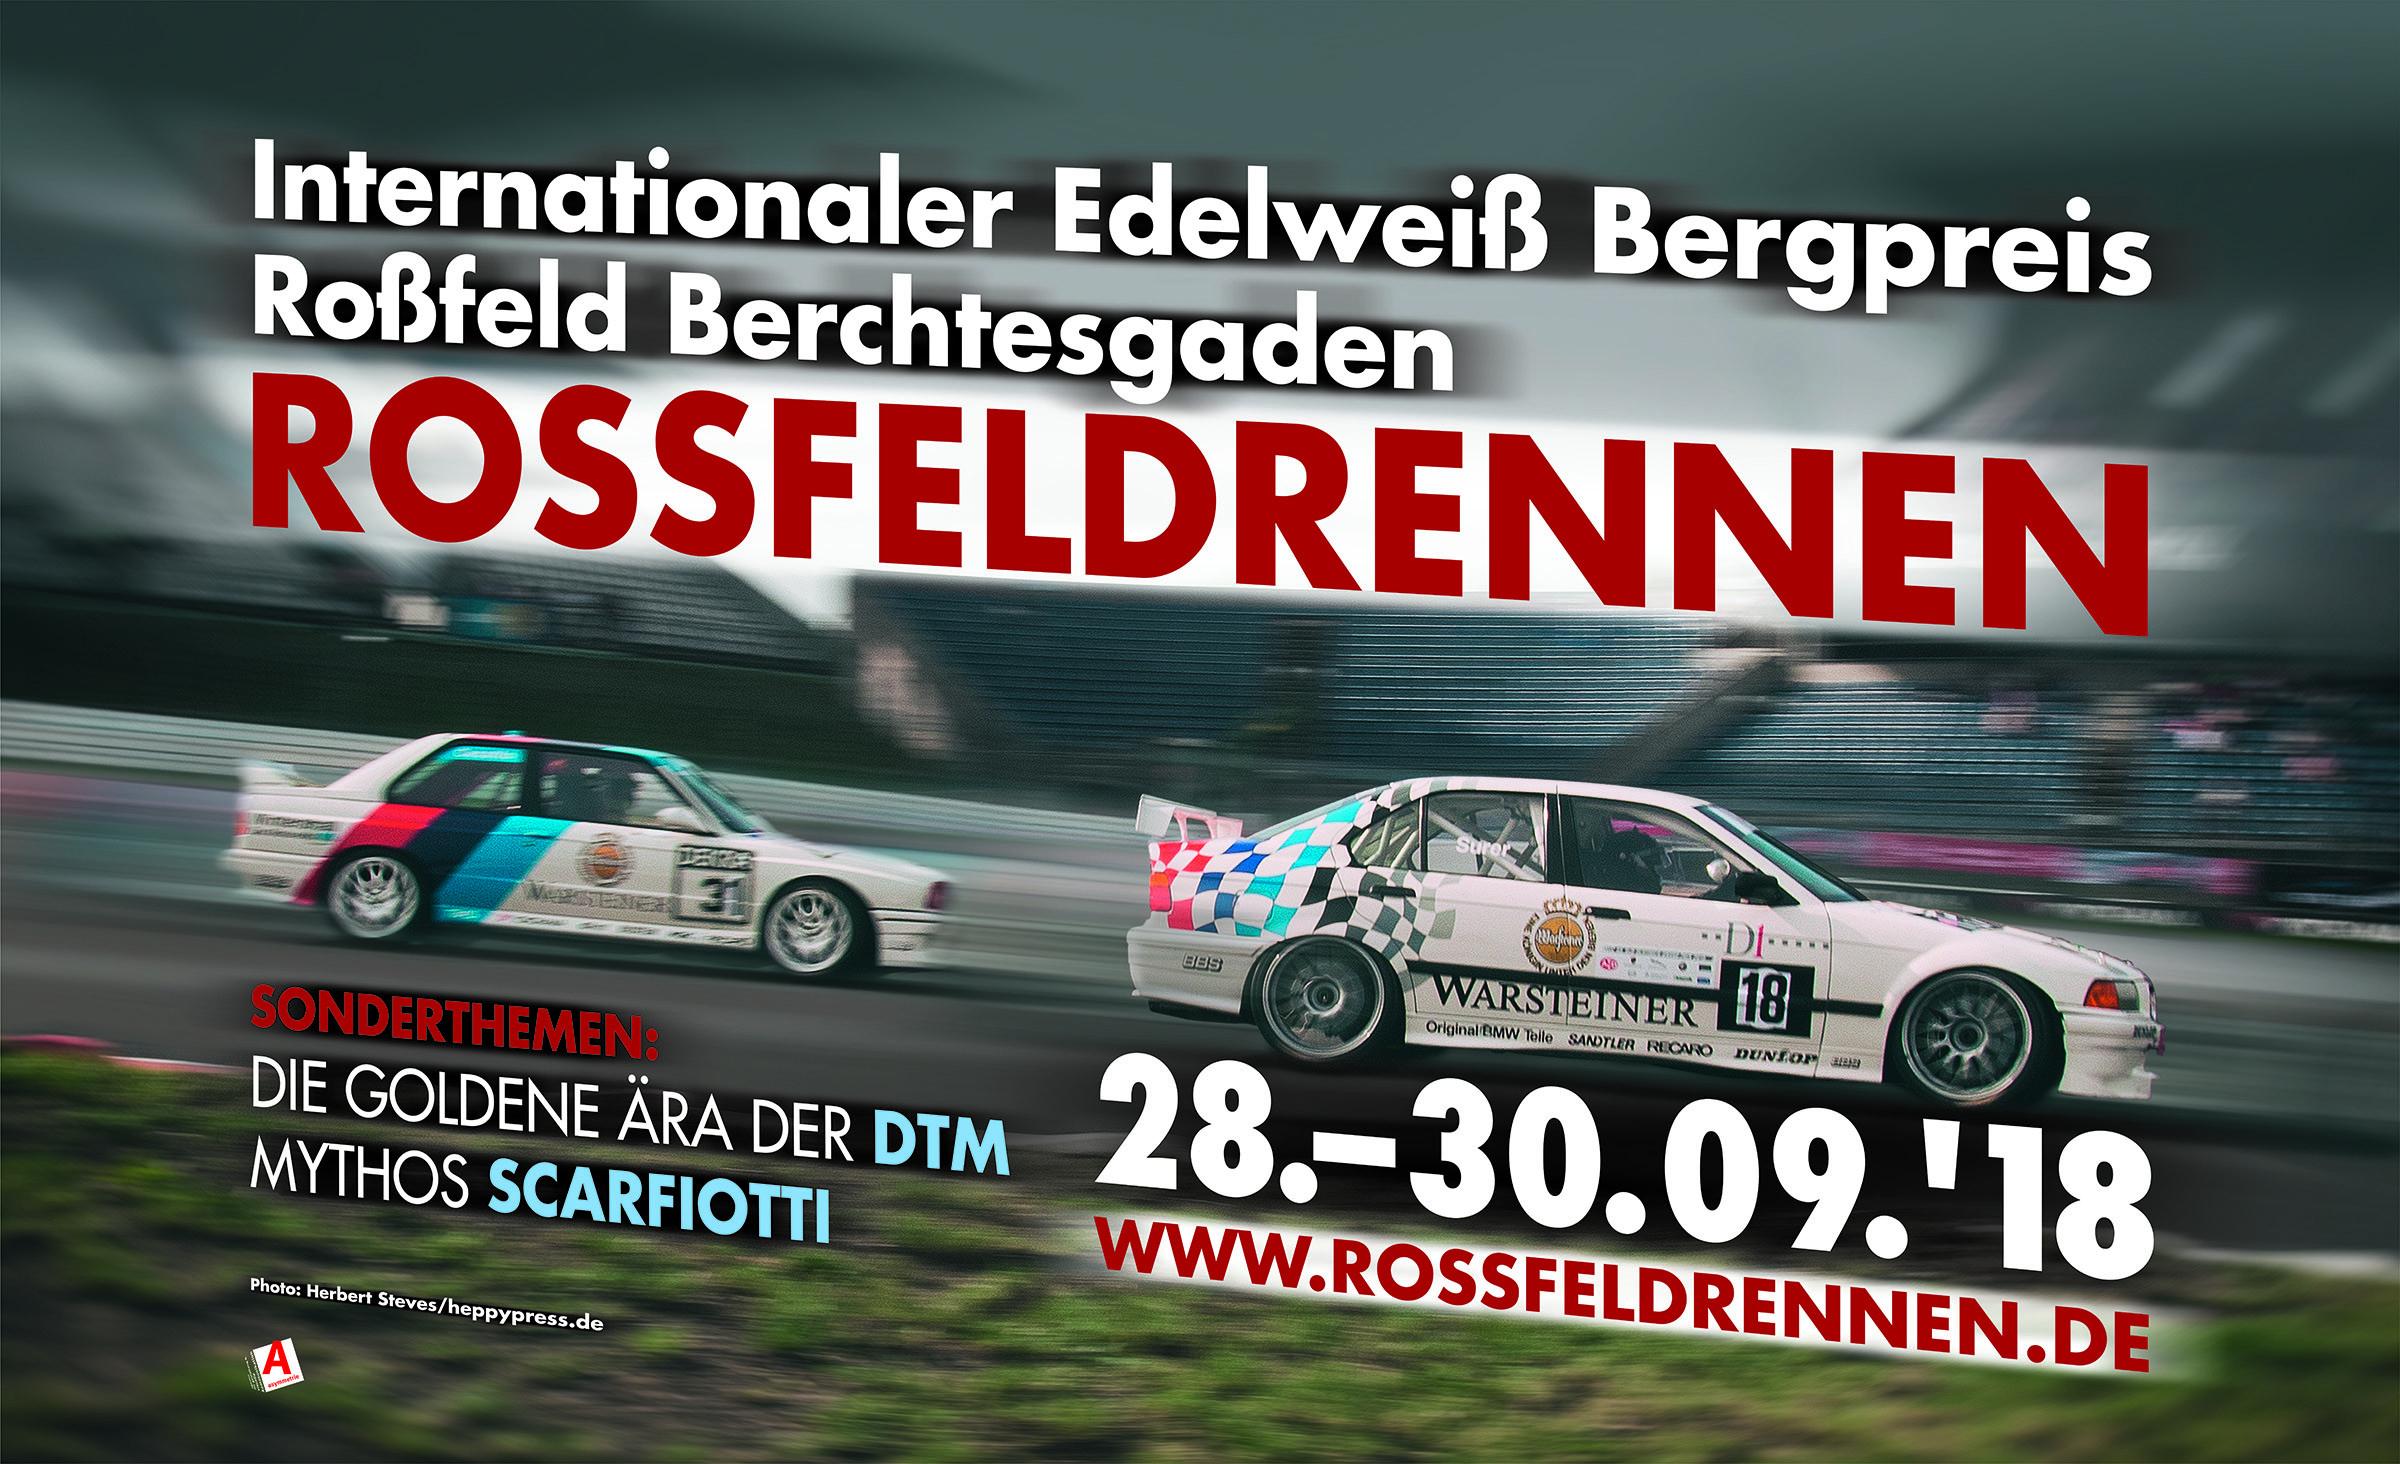 Internationaler Edelweiß Bergpreis Roßfeld Berchtesgaden 2018